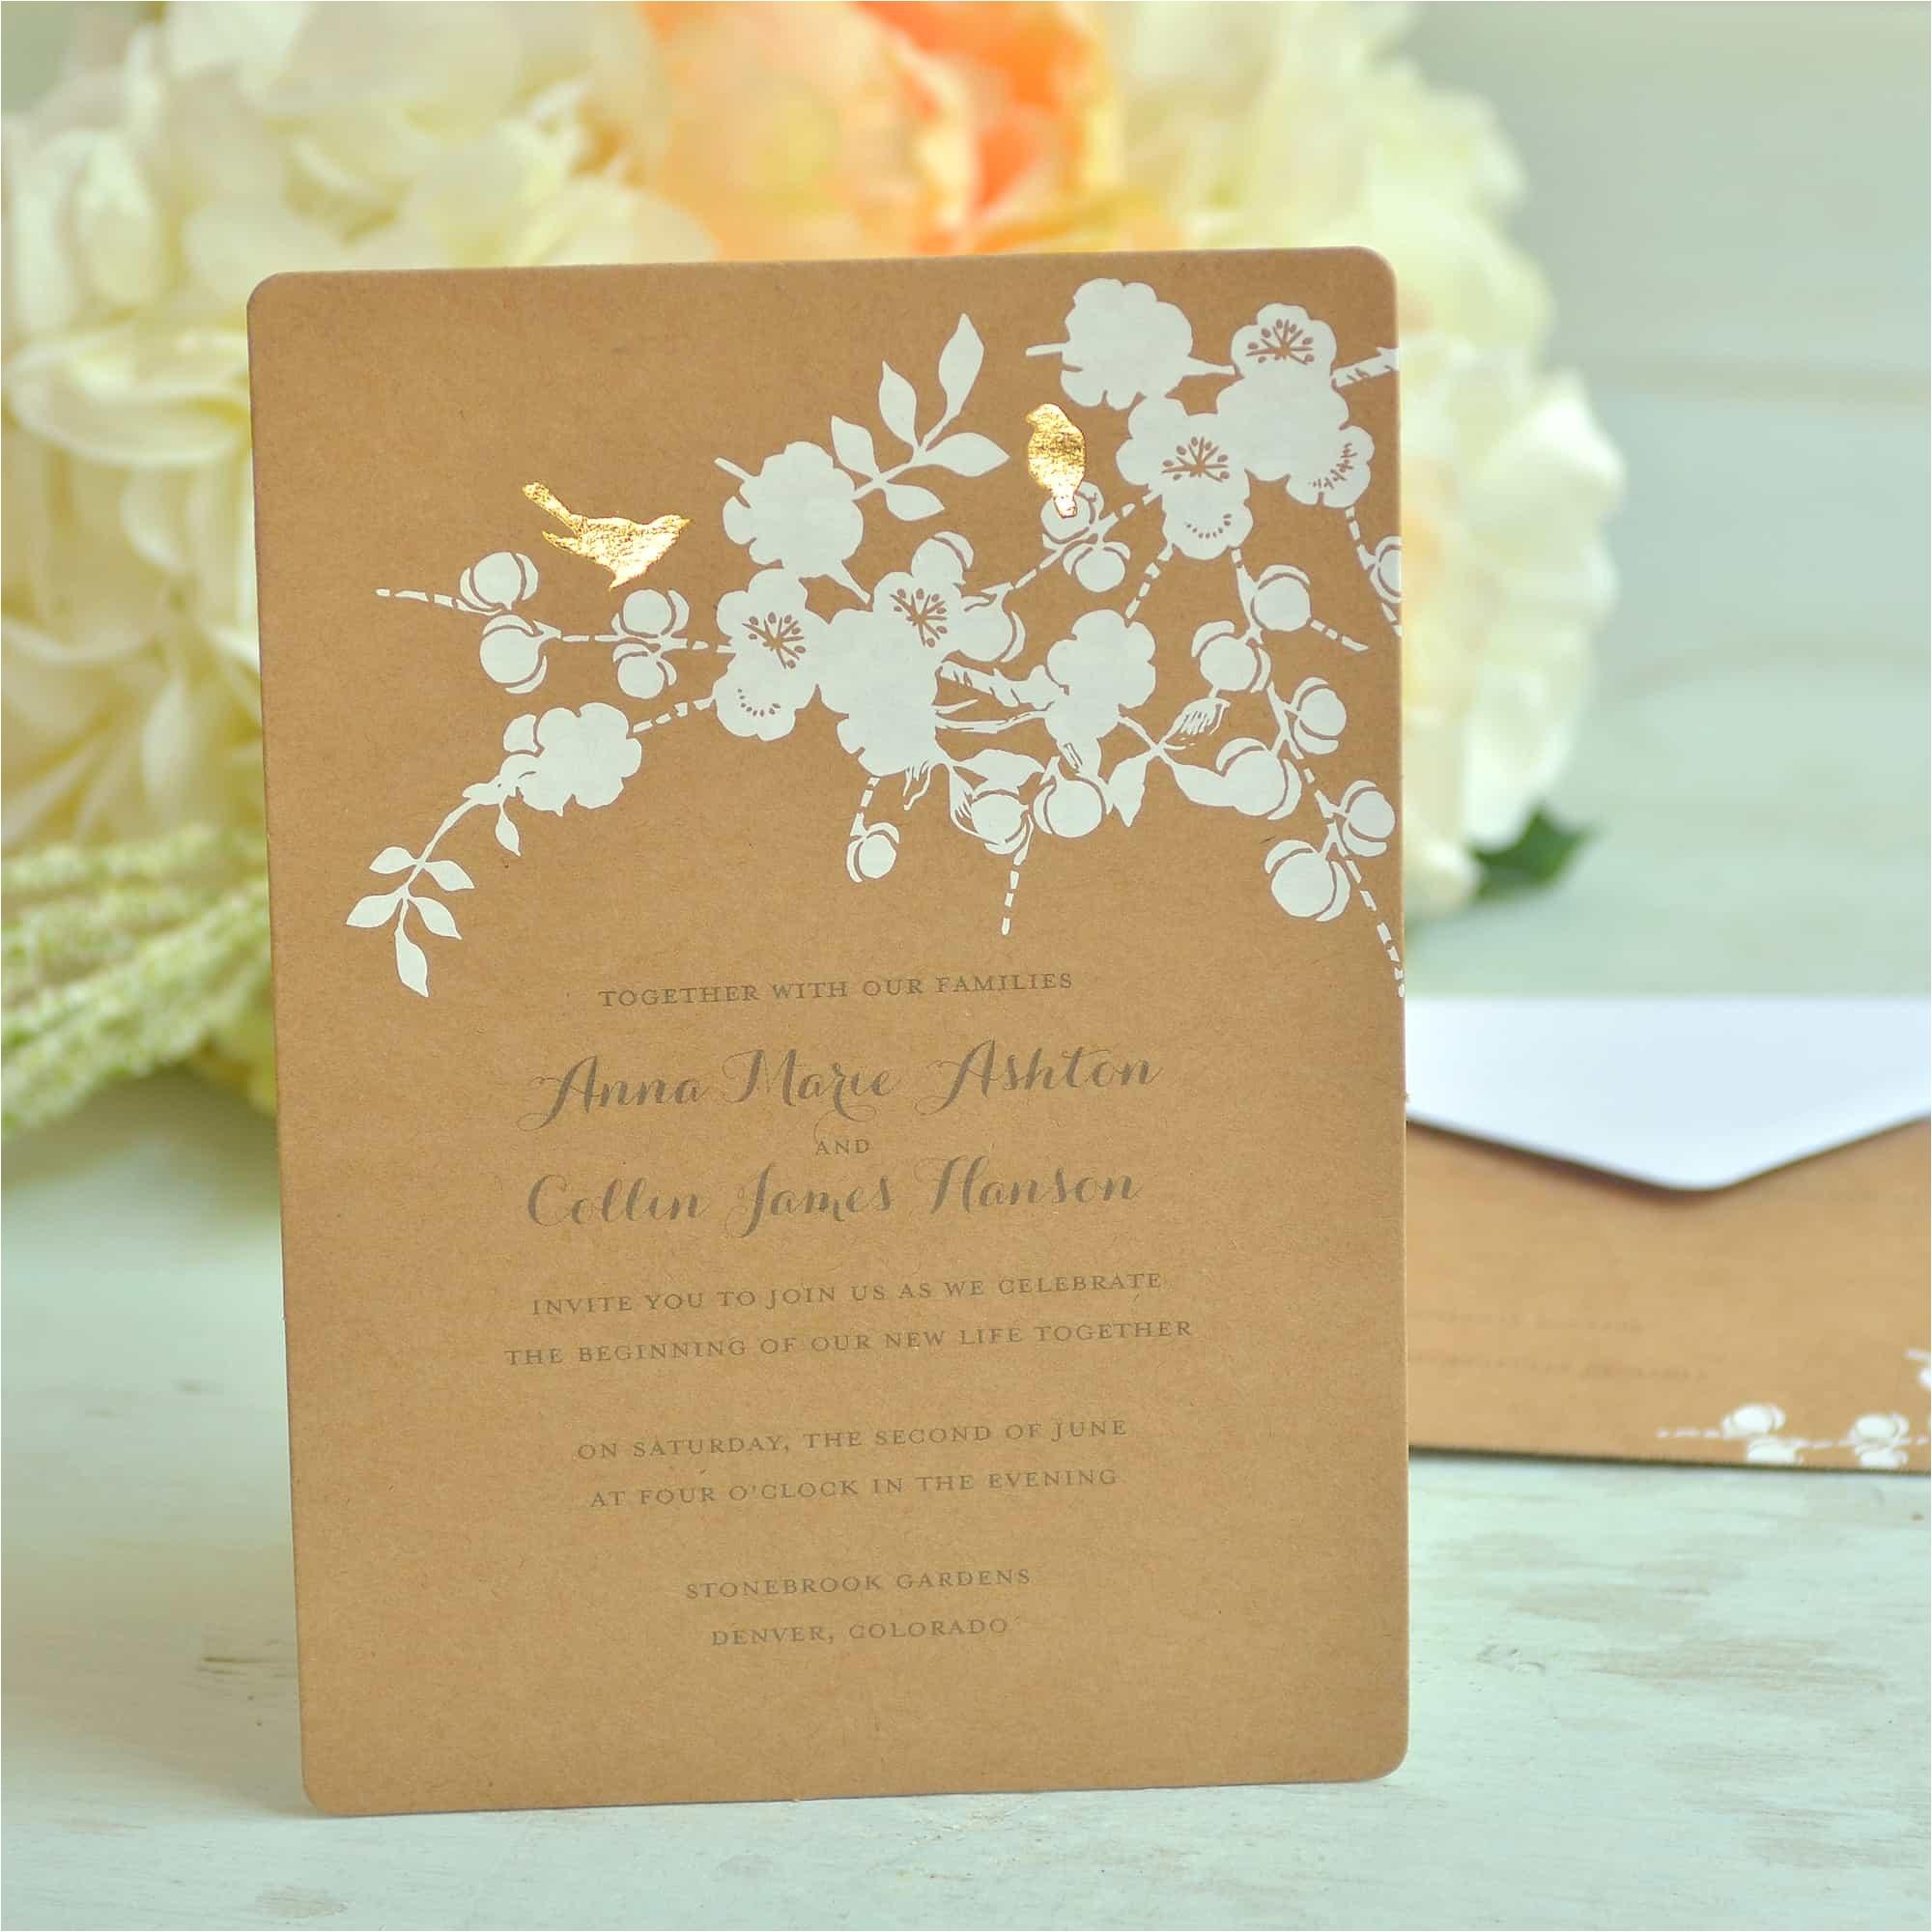 the walmart wedding invitations templates